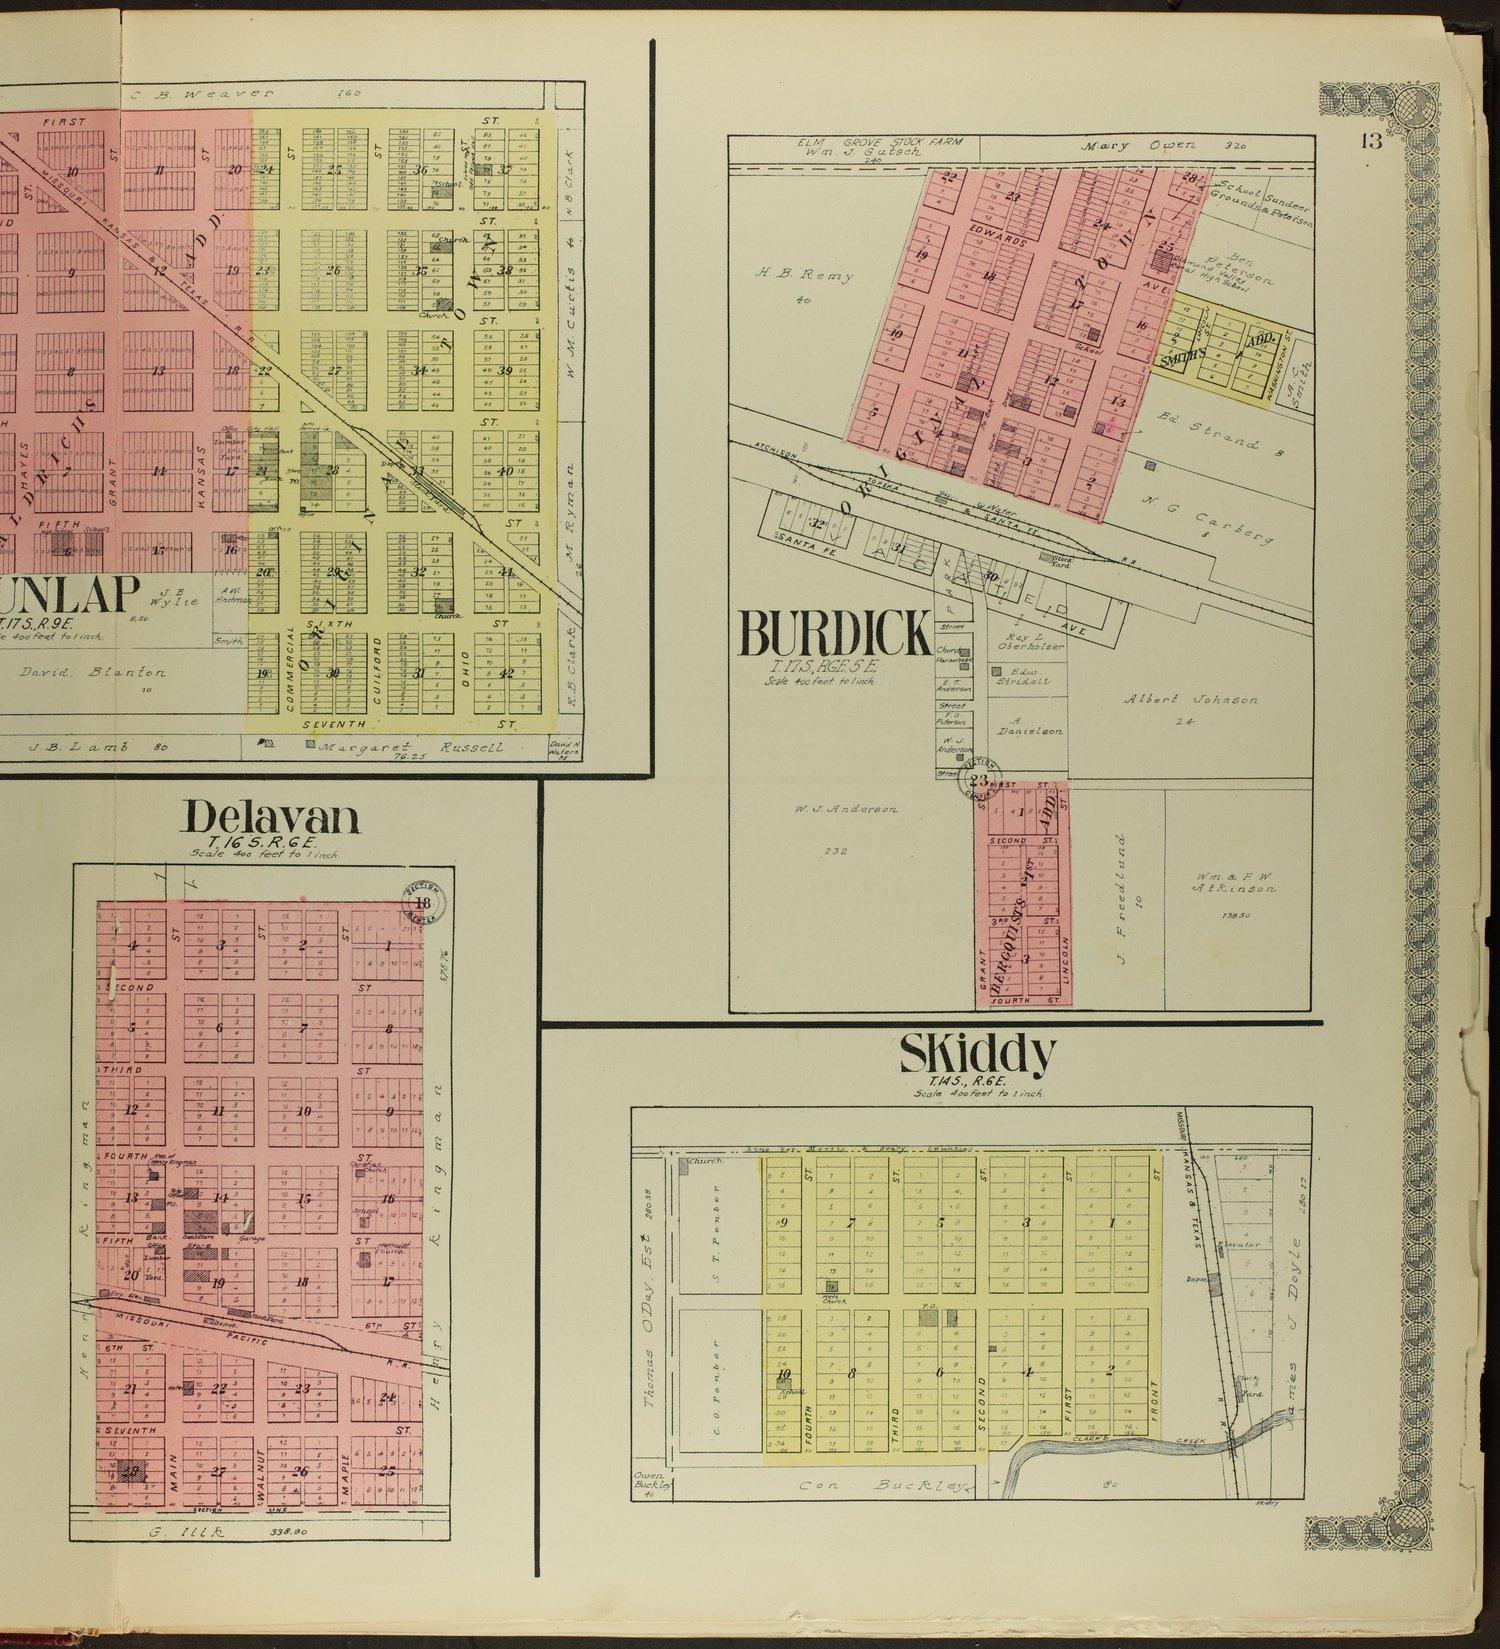 Standard atlas of Morris County, Kansas - 13